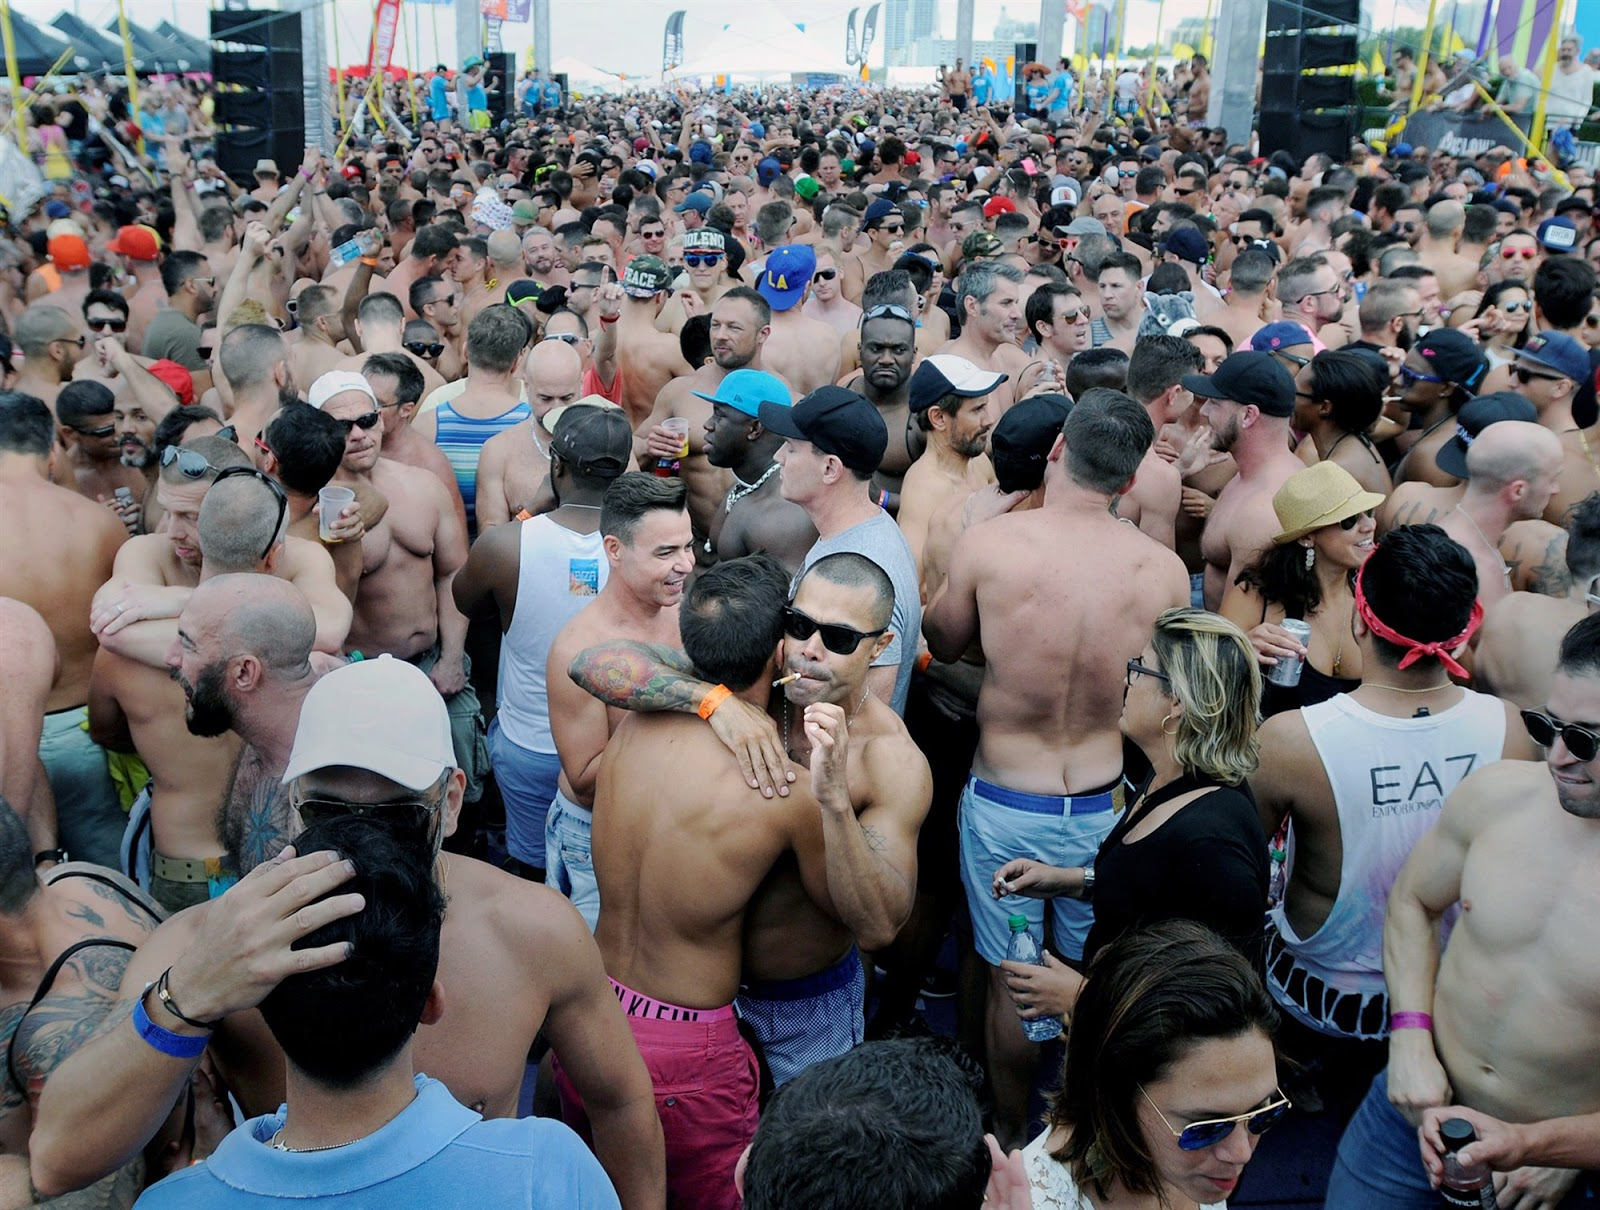 Miami Gay Festival